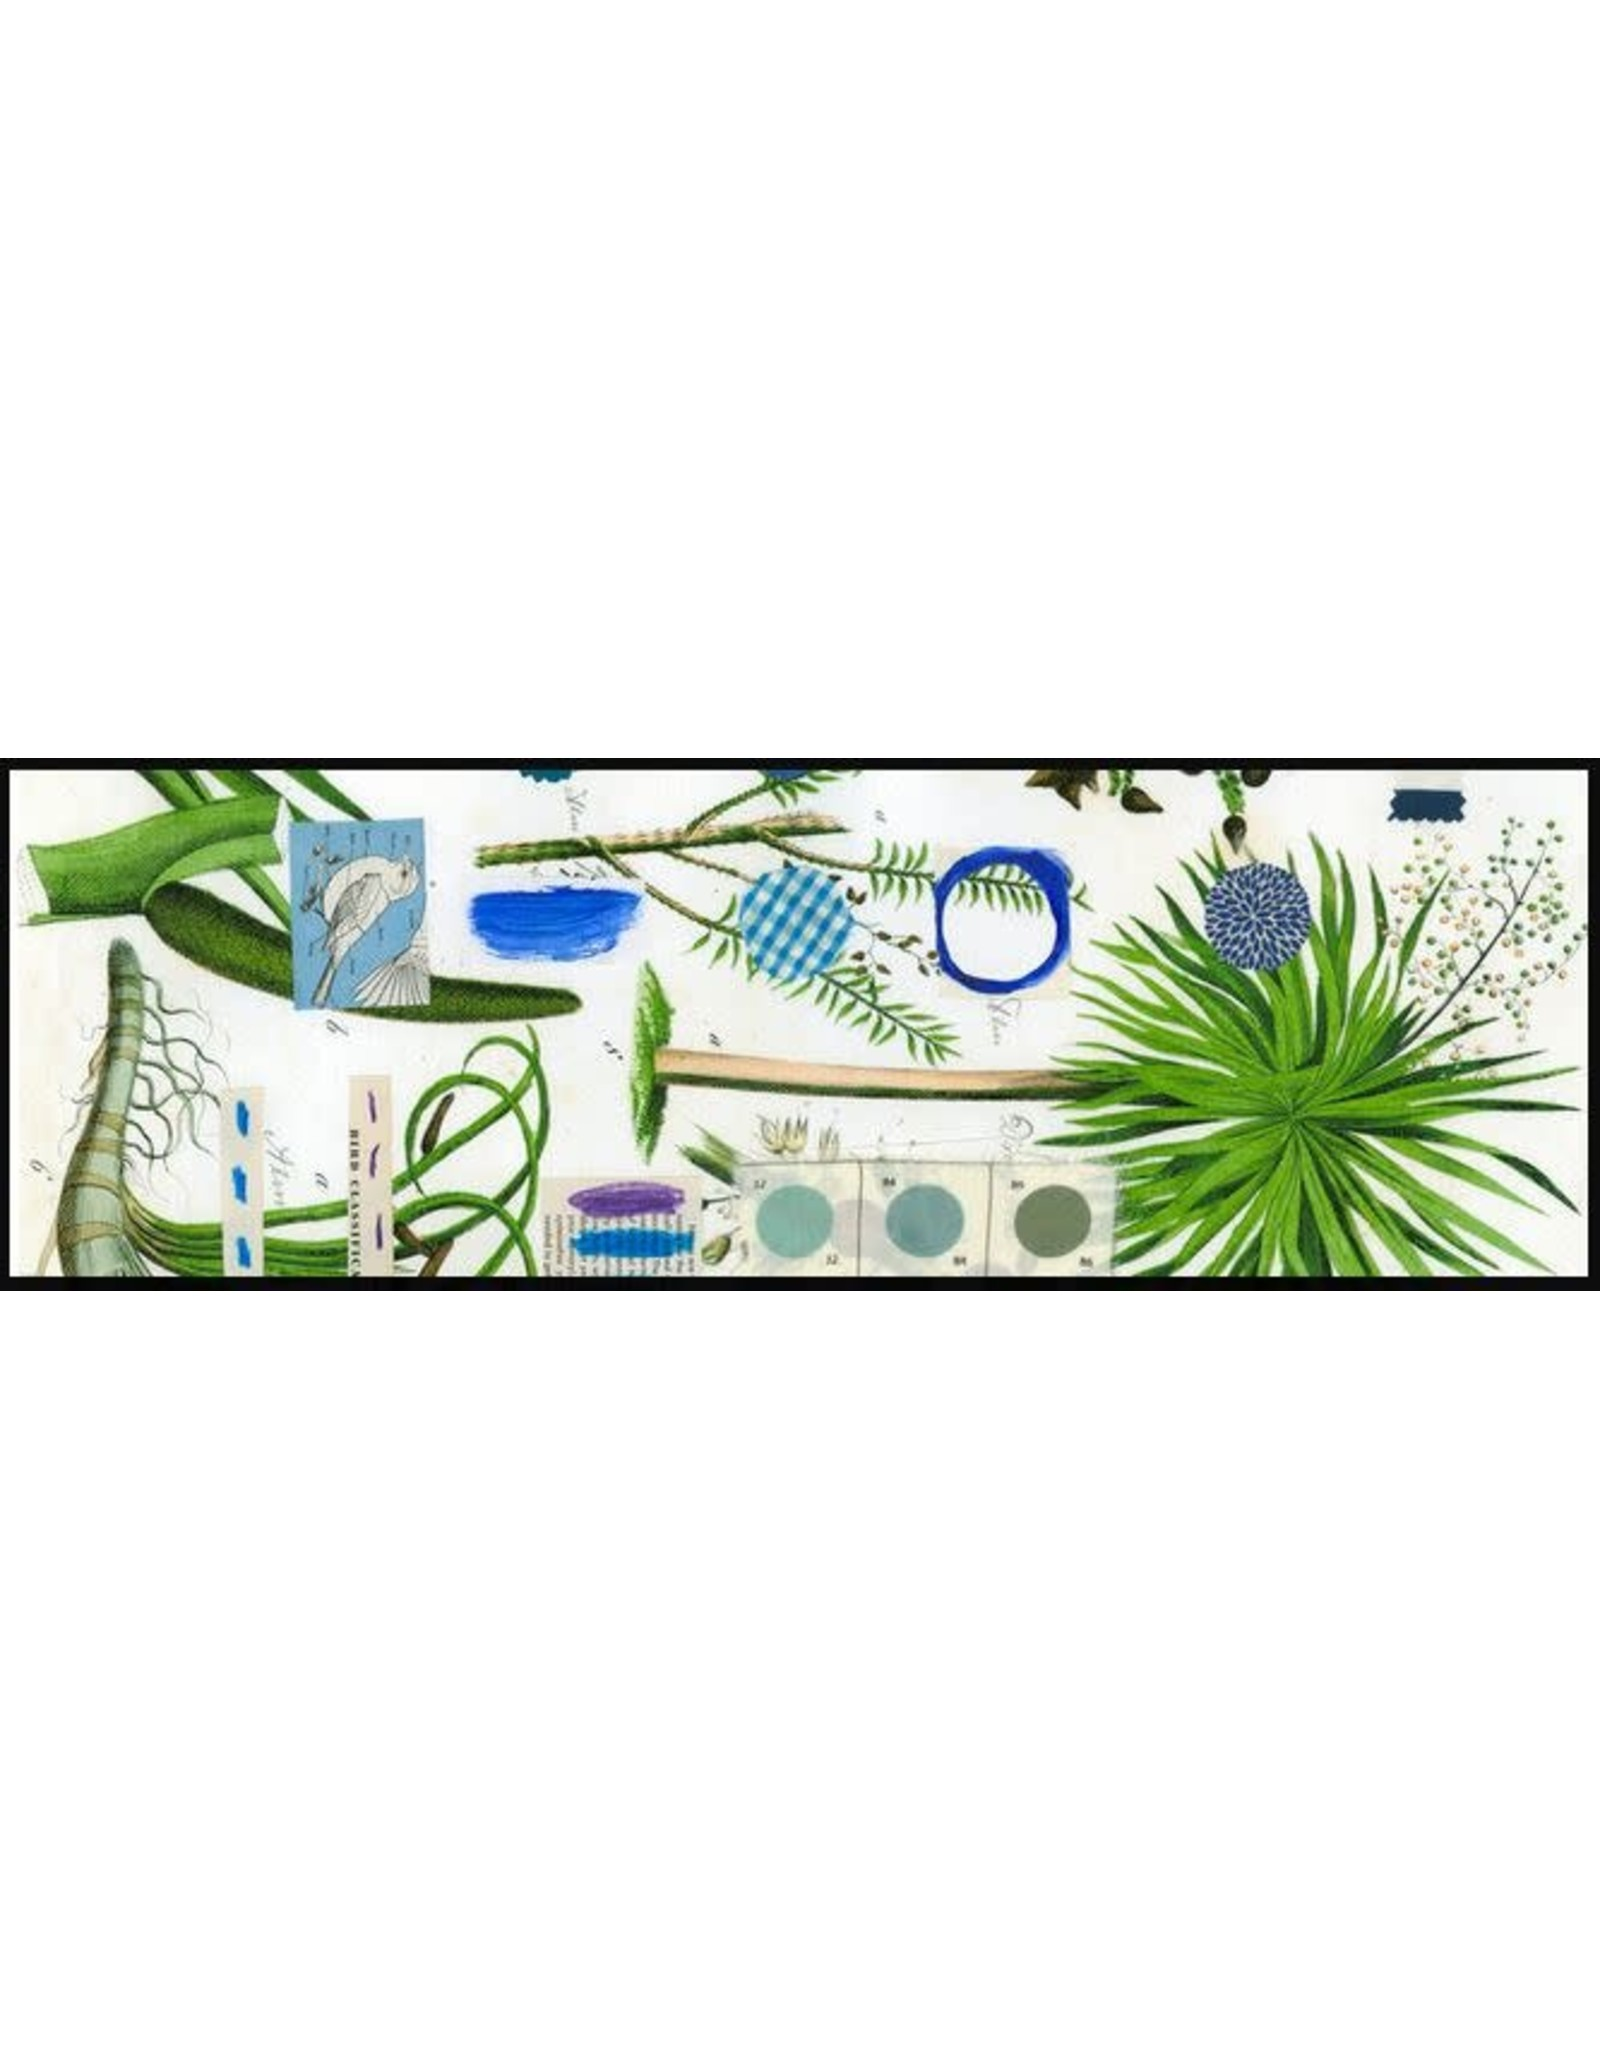 Smilow + Mathiesen Blue Botanical Runner | Pamela Smilow